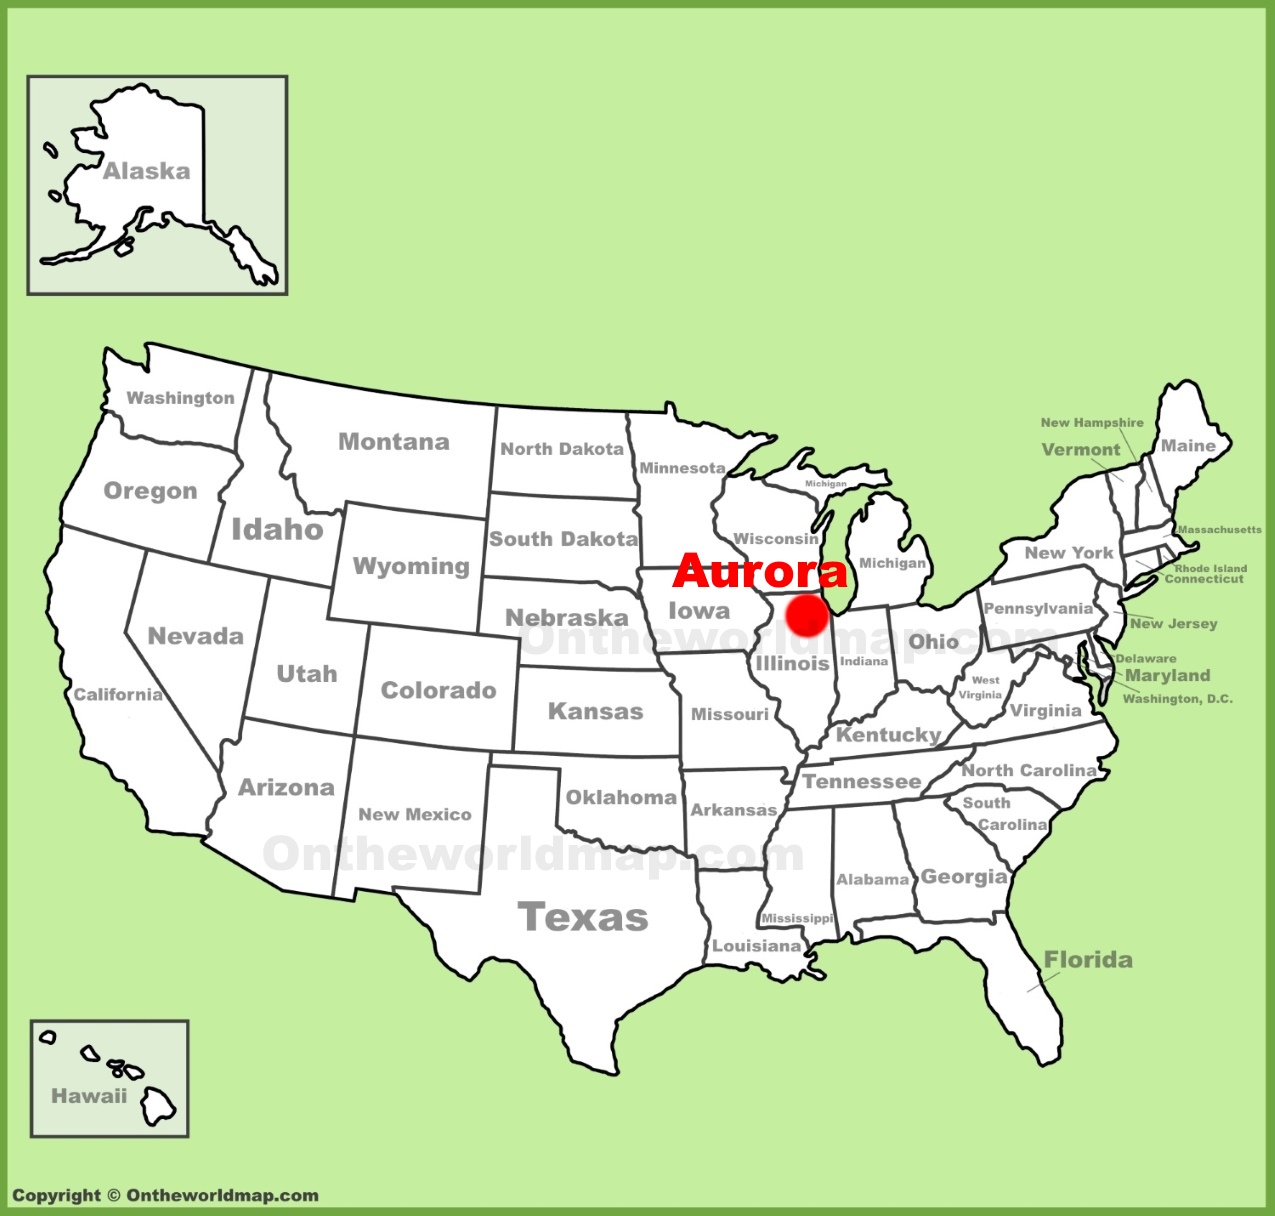 Aurora Illinois Location On The U S Map